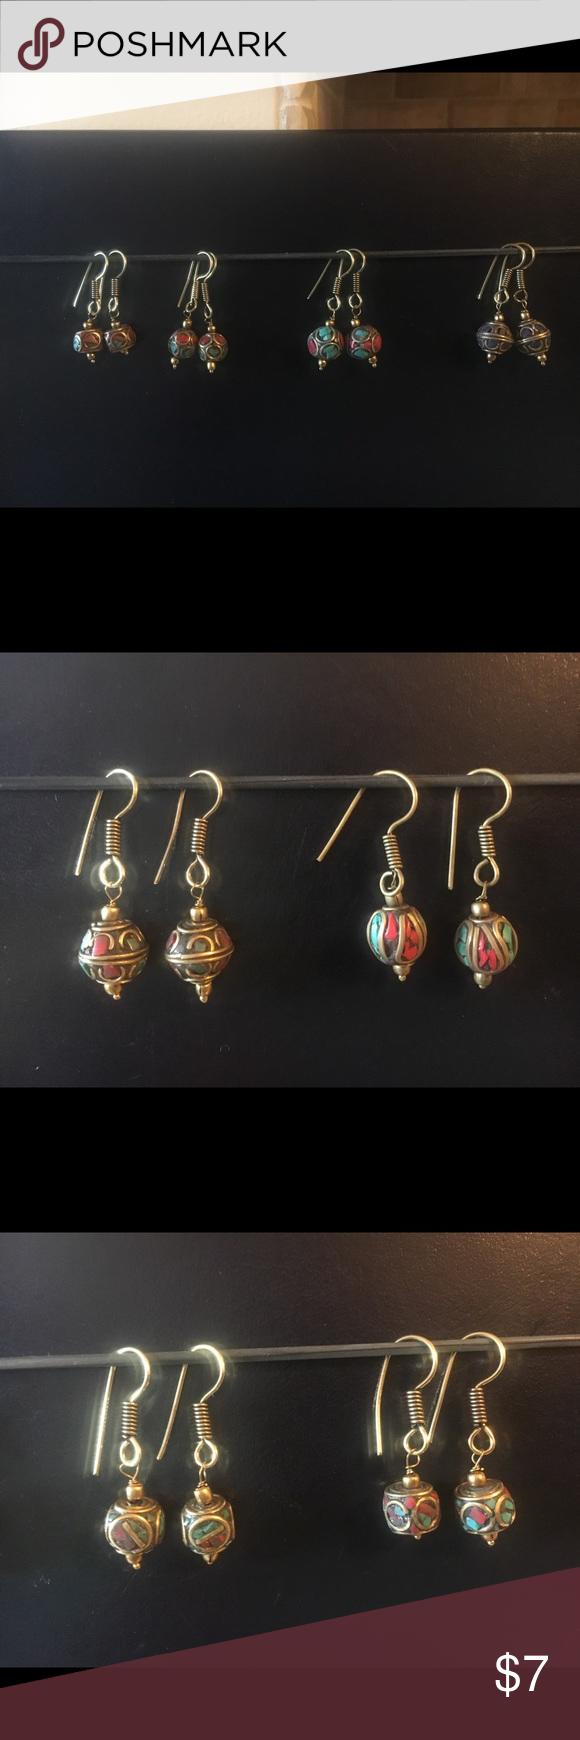 Brass beads hook earrings light ethnic jewelry nwt ethnic jewelry